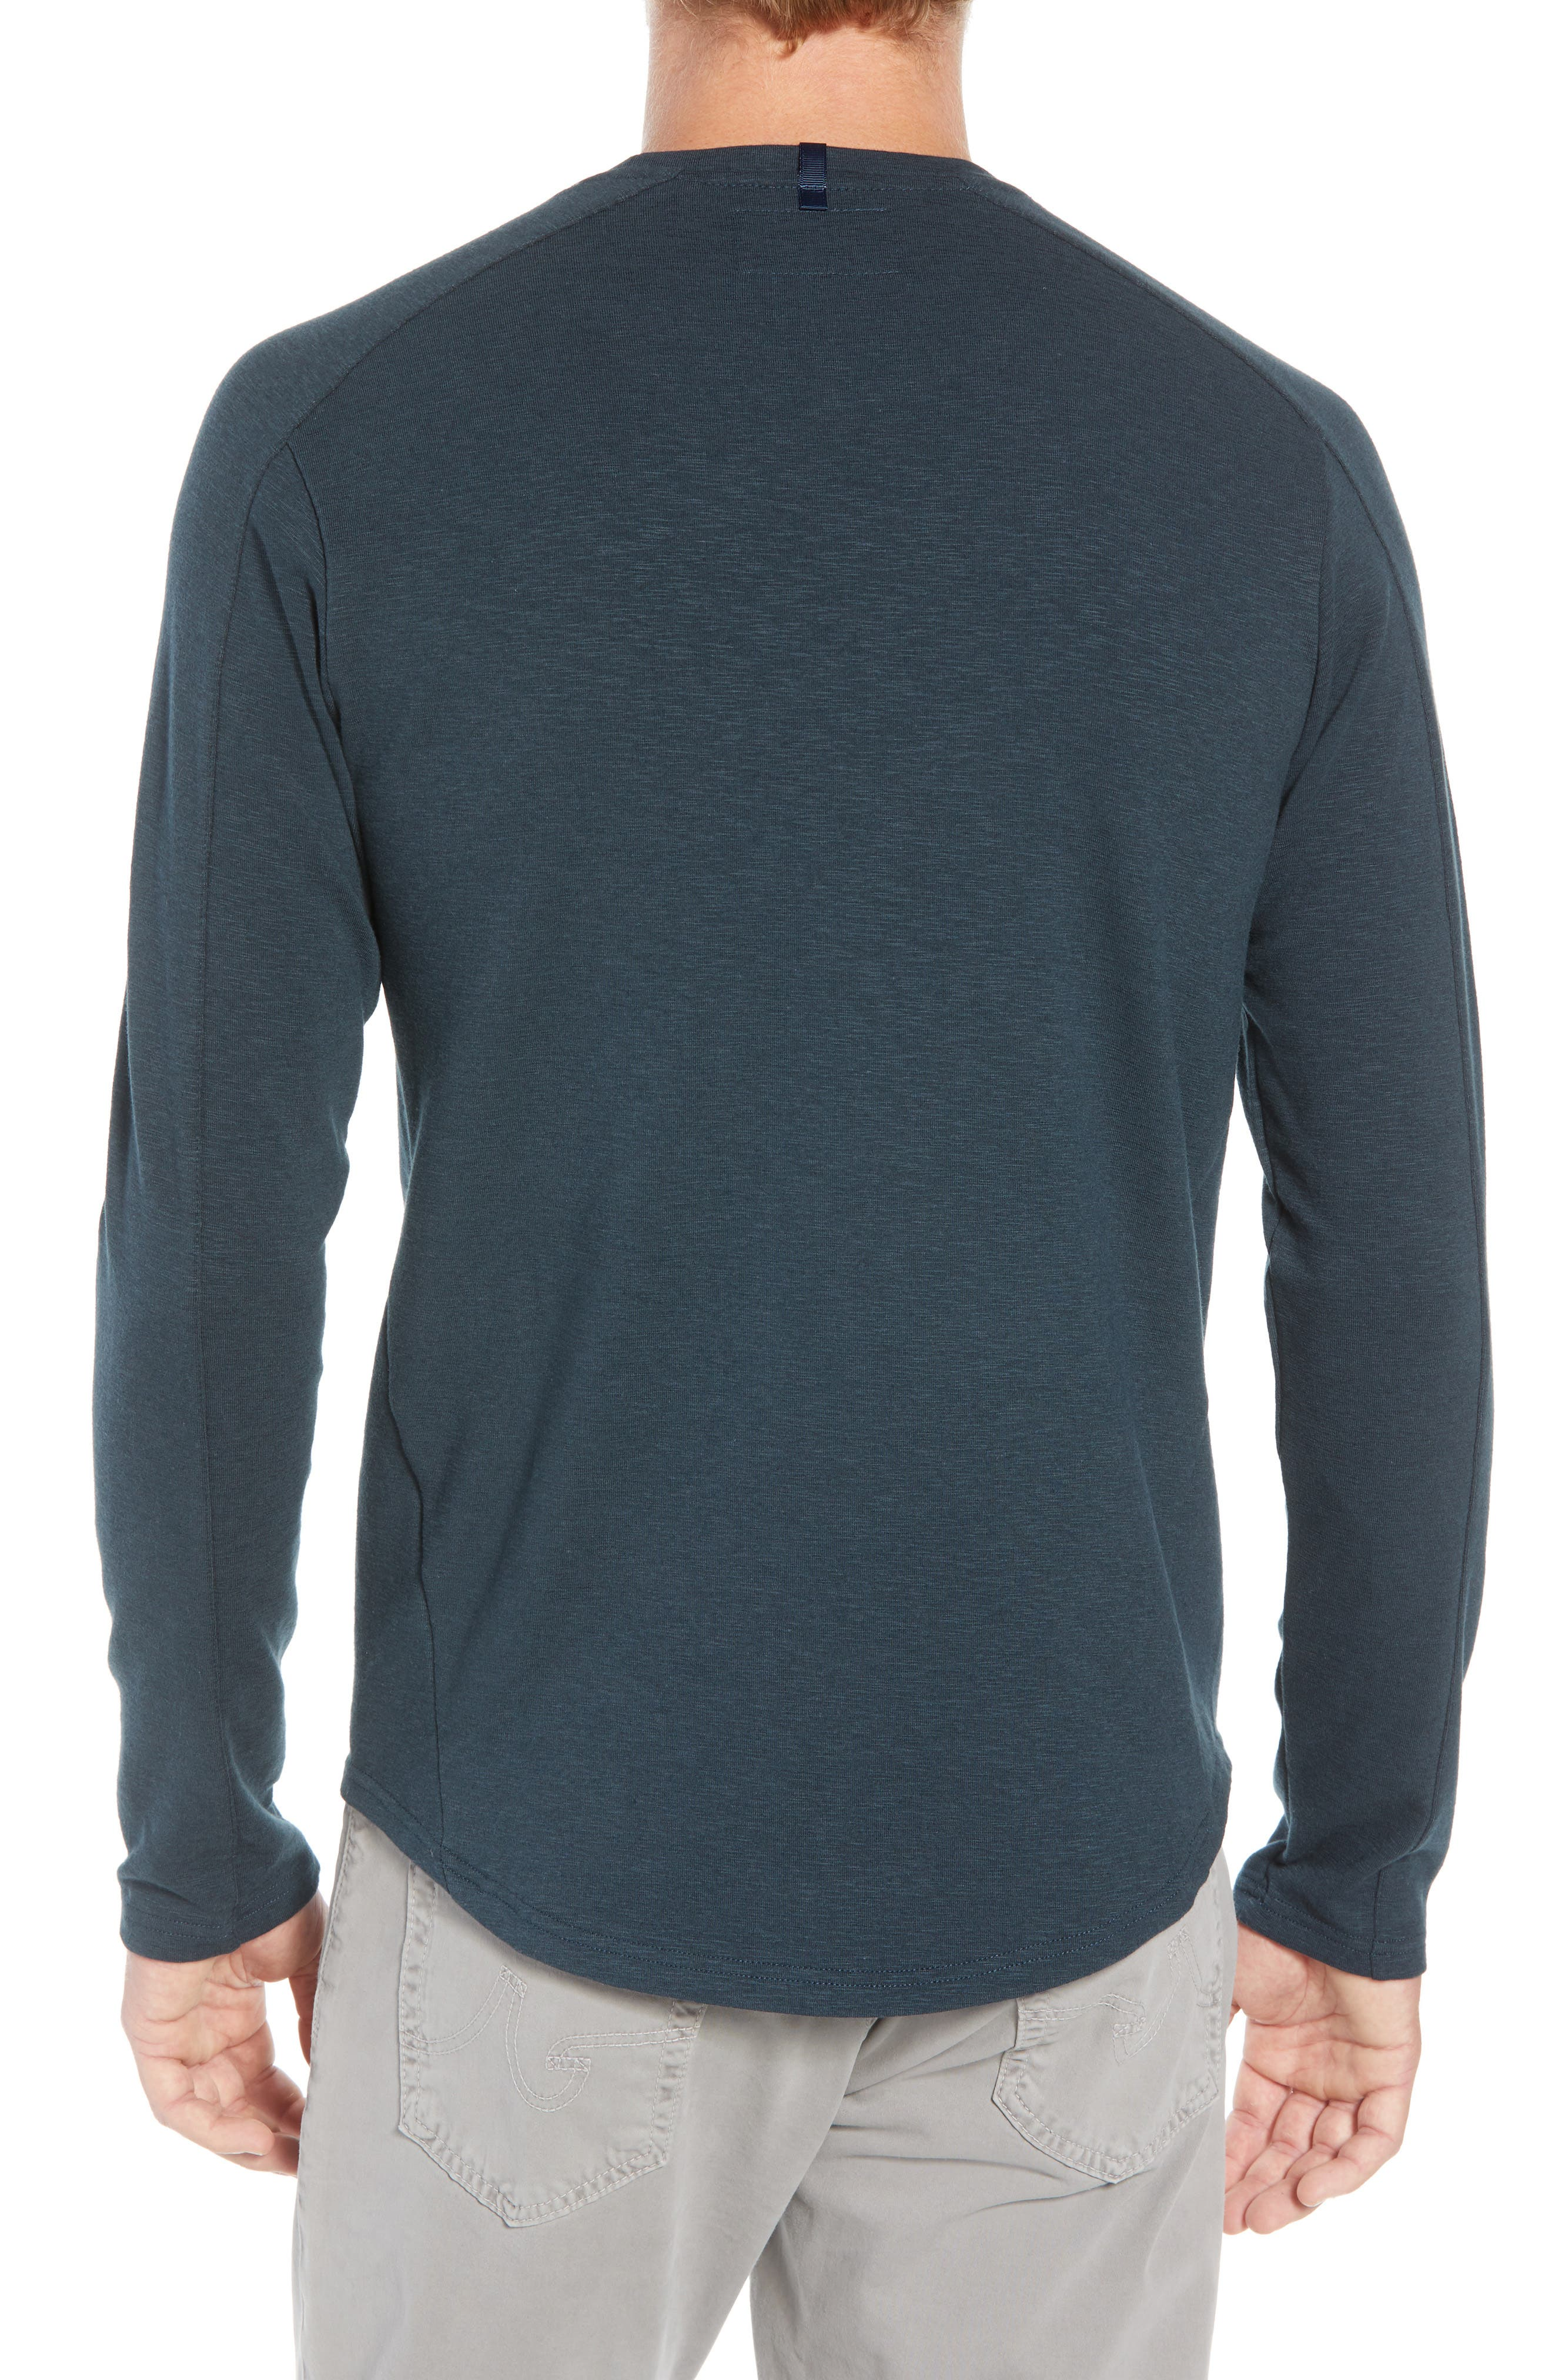 Douglas Slub Long Sleeve T-Shirt,                             Alternate thumbnail 2, color,                             TEAL